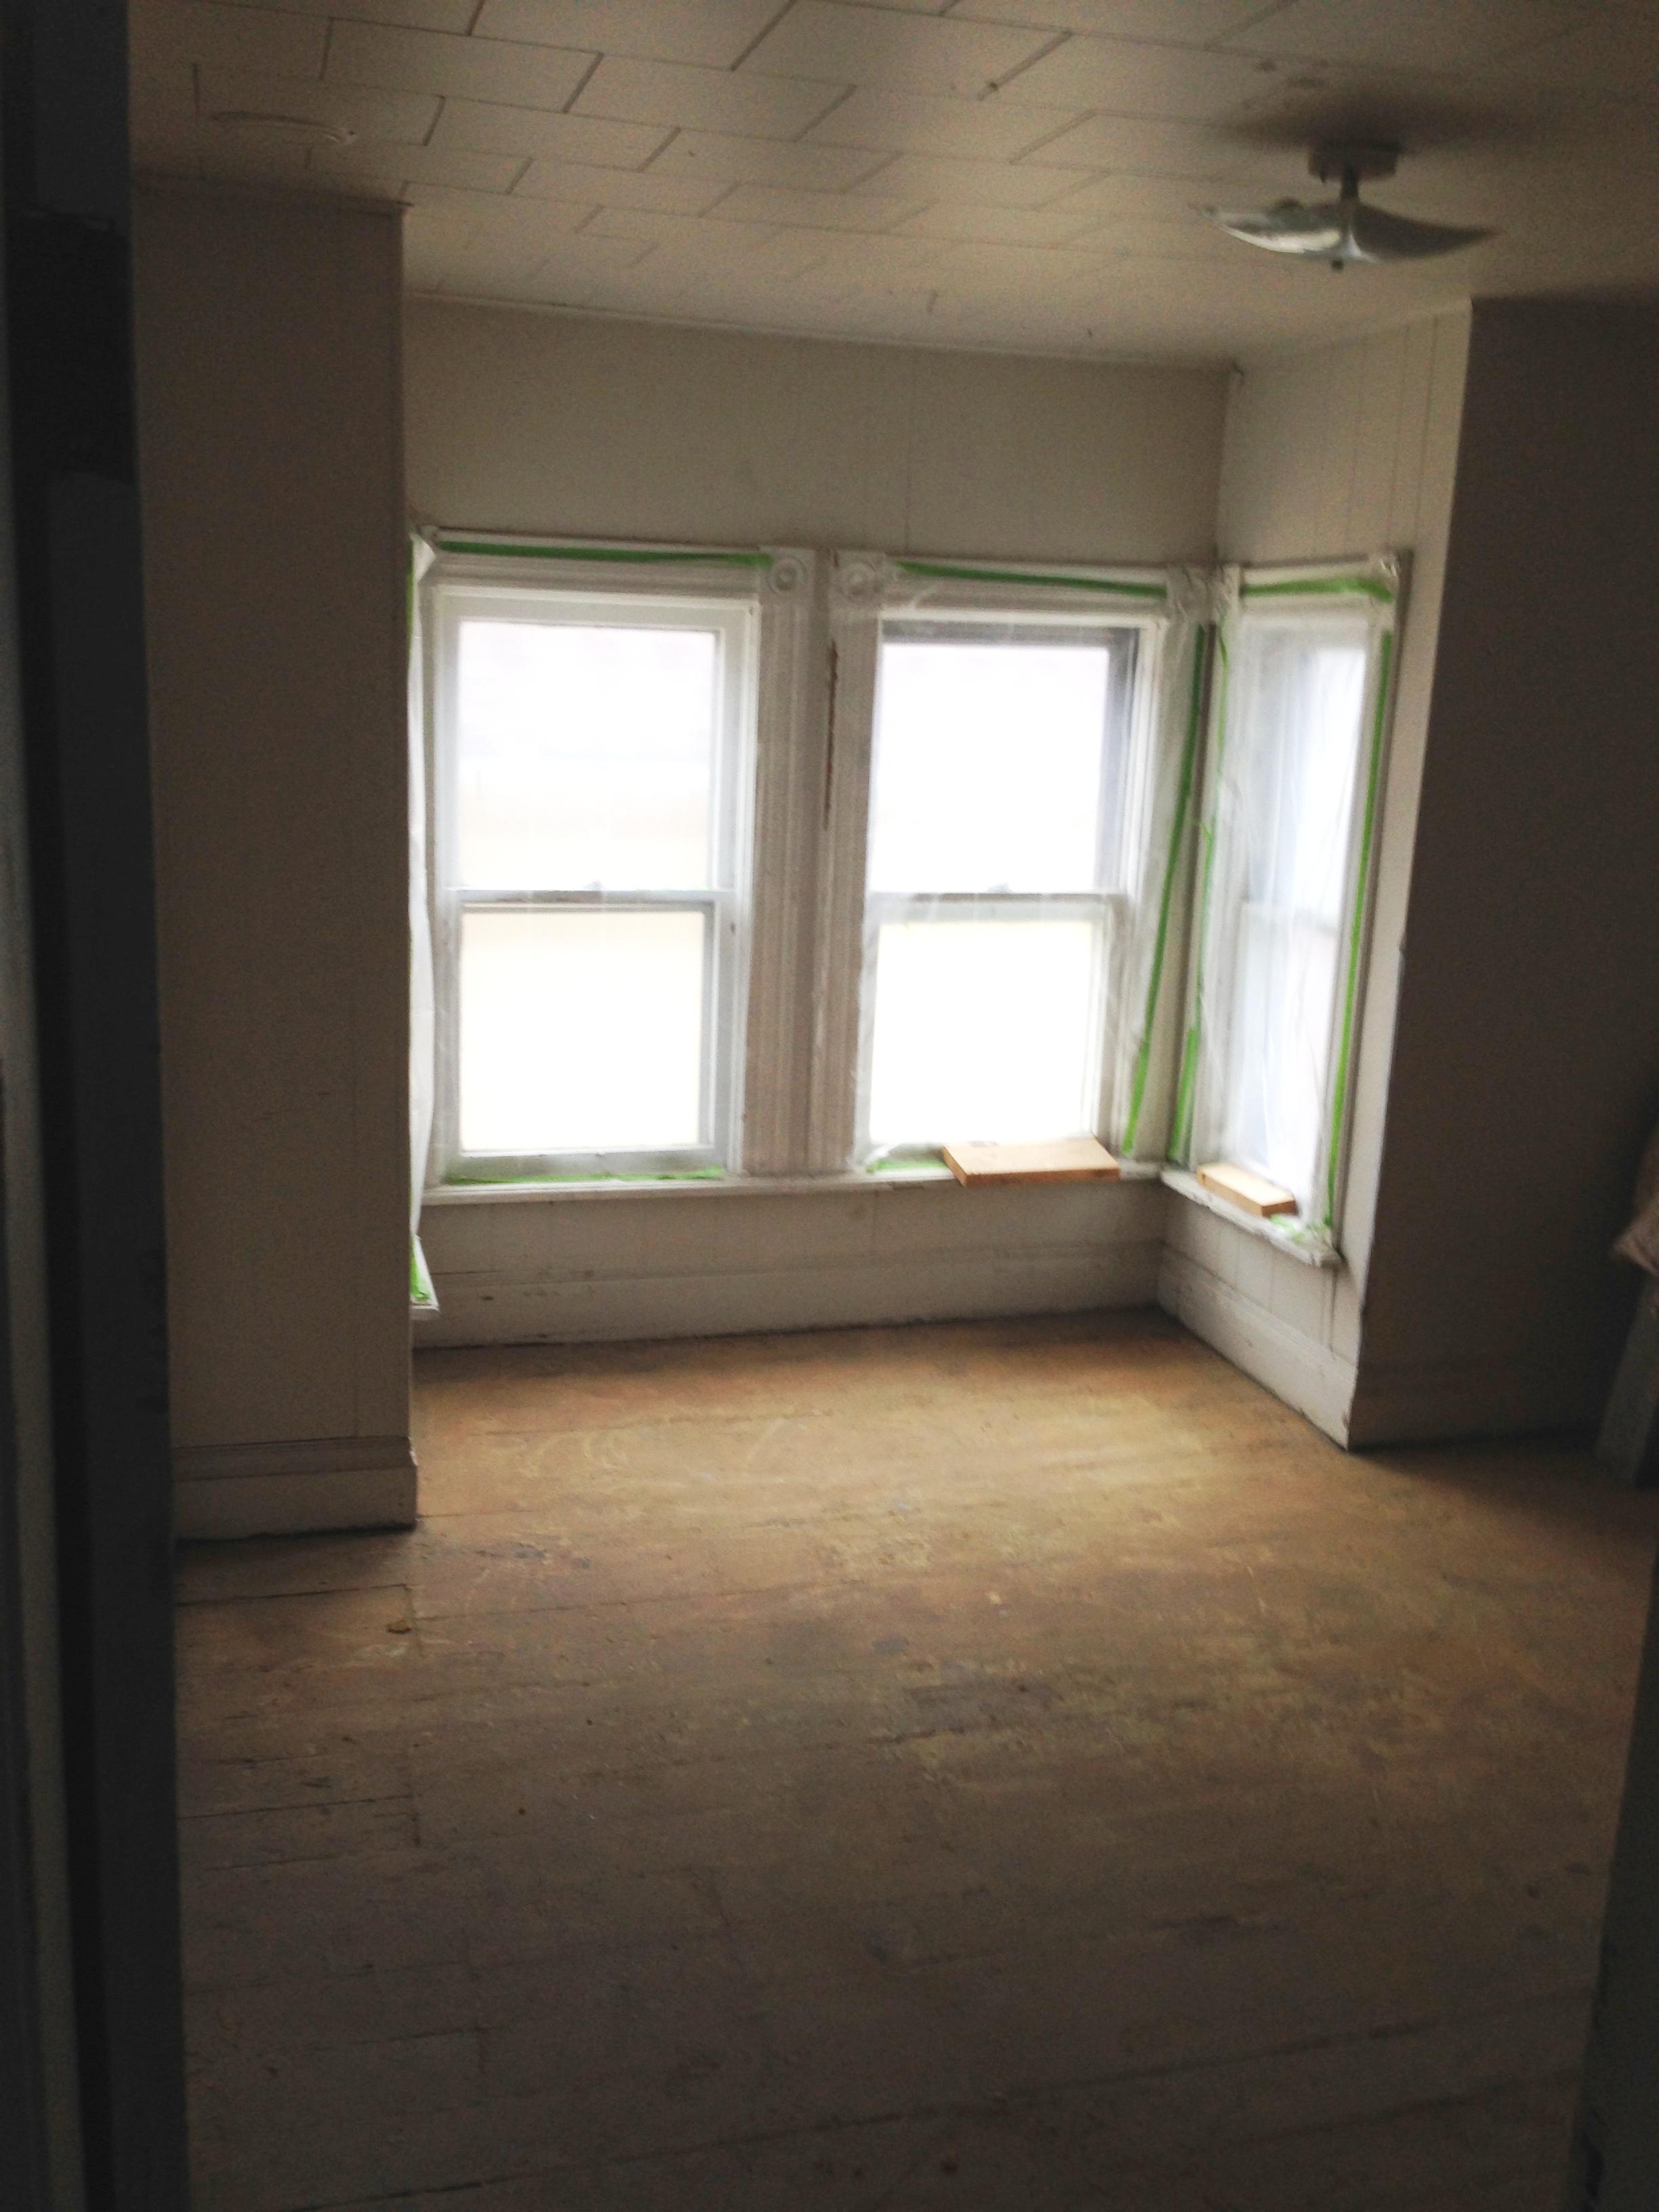 621 Up Bedroom or Living Room